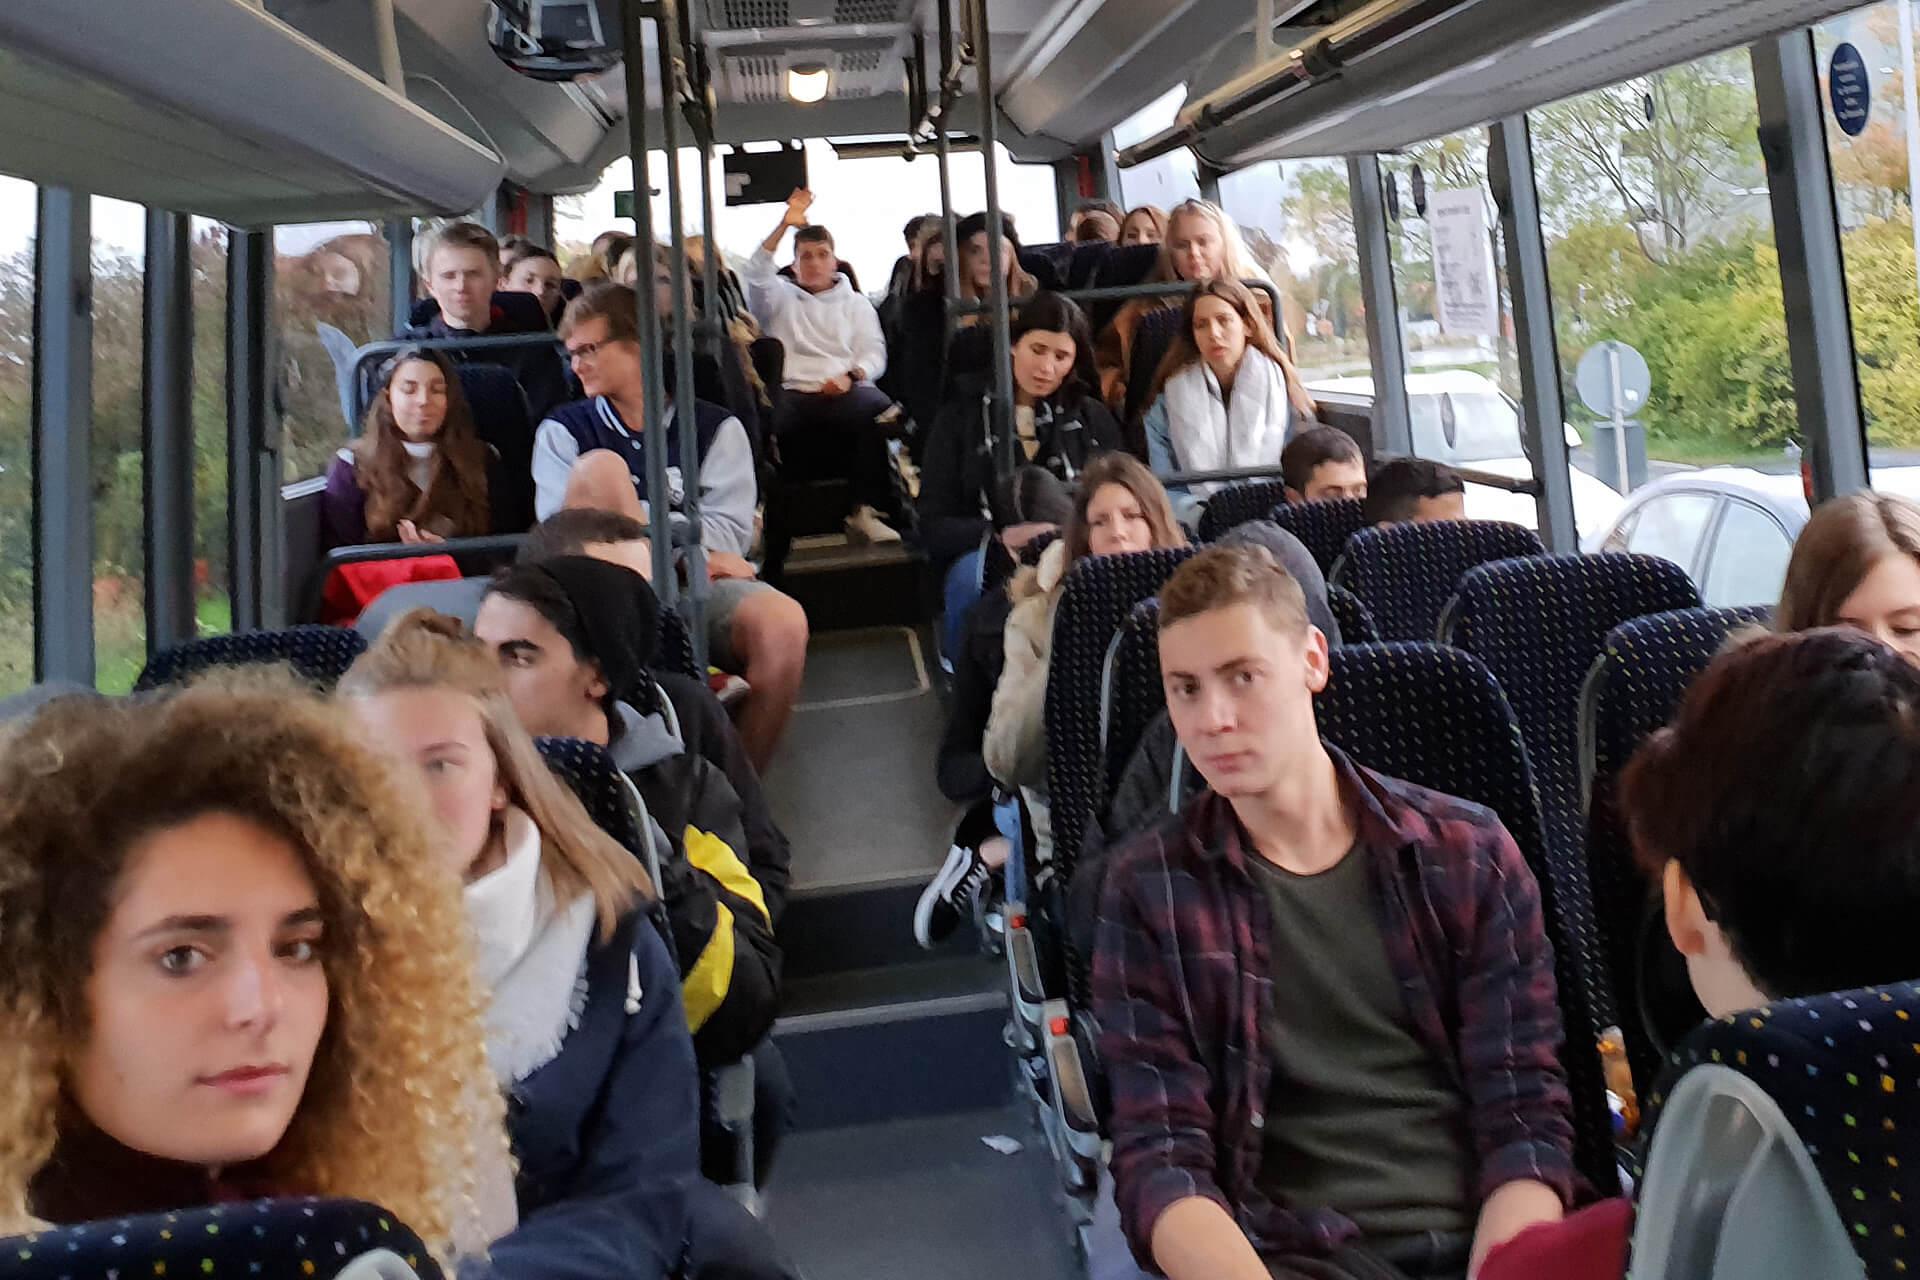 2018 10 06 Israelaustausch Weiden Content Beitragsbild 21